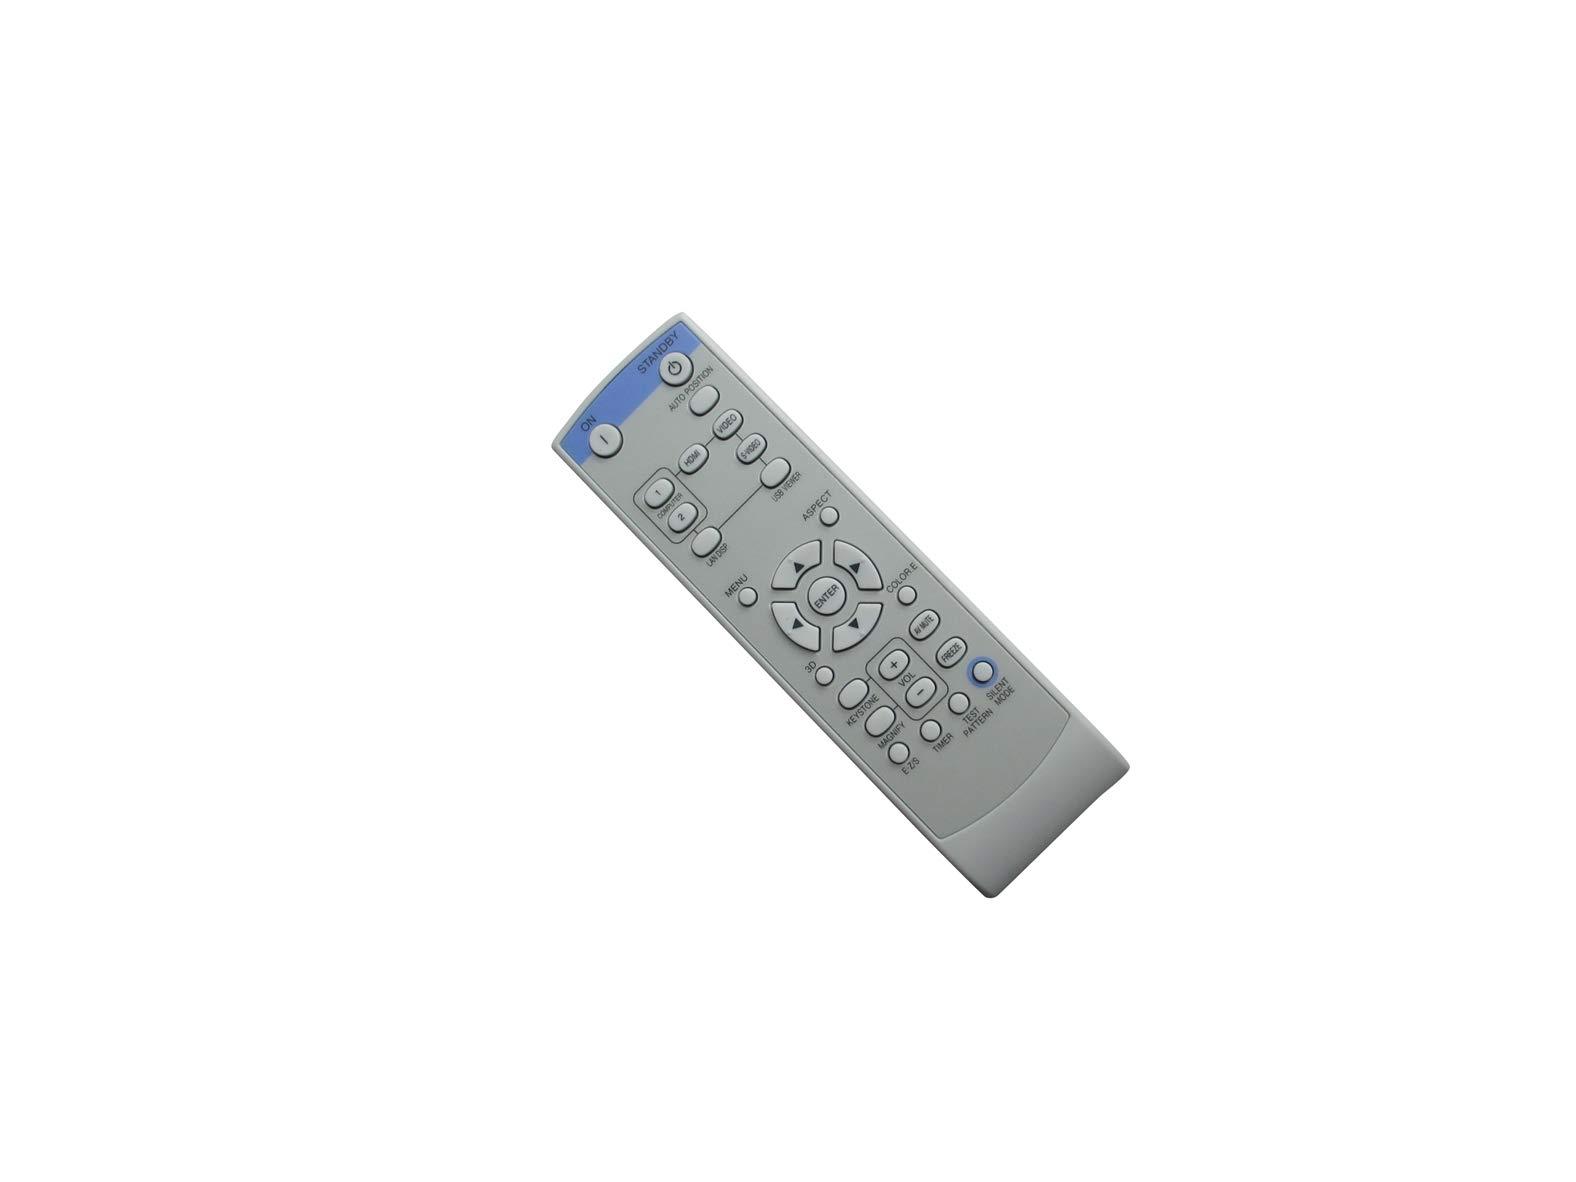 HCDZ Replacement Remote Control for Mitsubishi FD630U FD630U-G FD630UG 1080P Conference Room DLP Projector